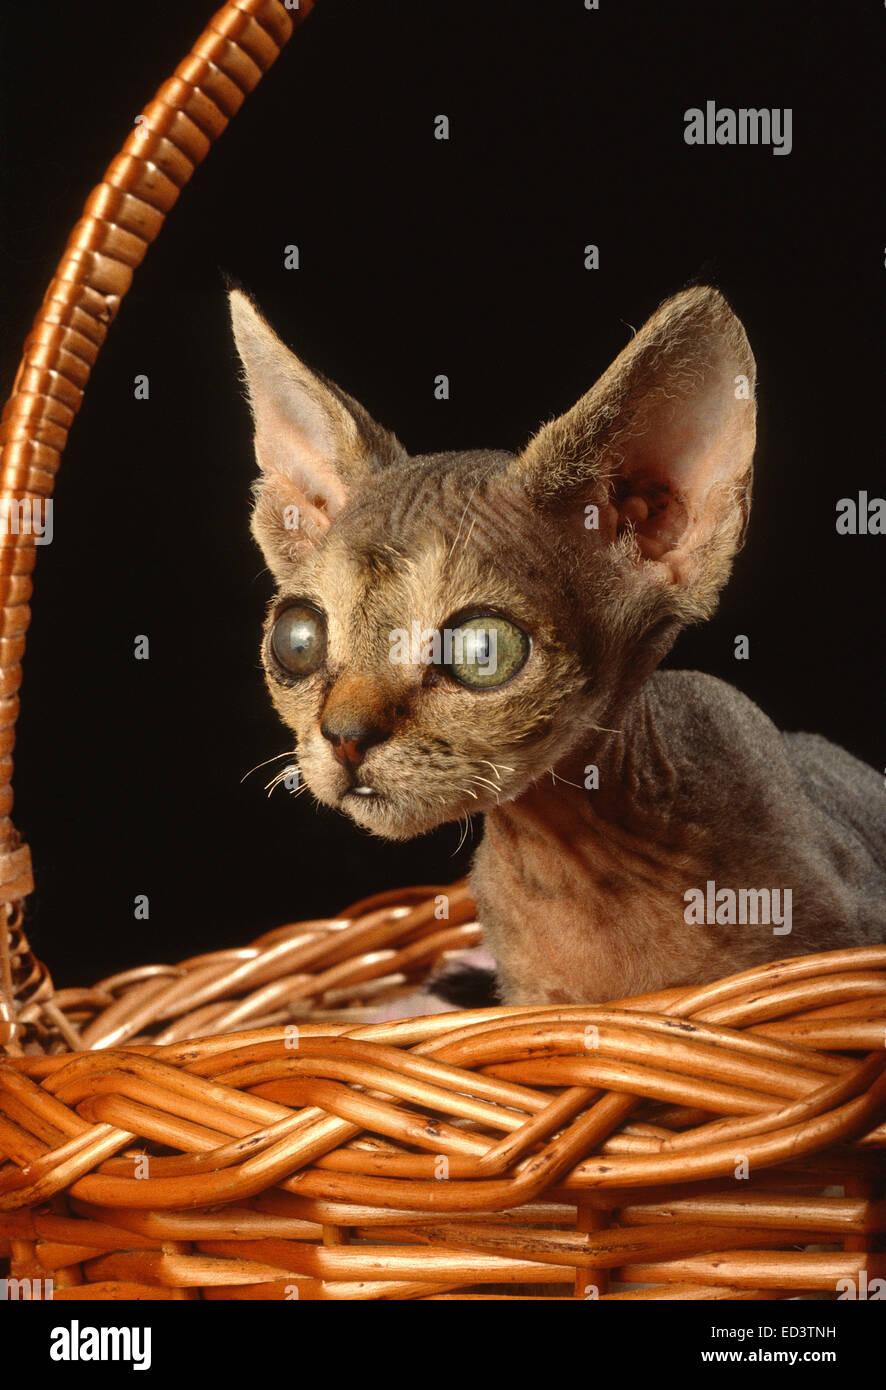 Devon Rex cat - Stock Image